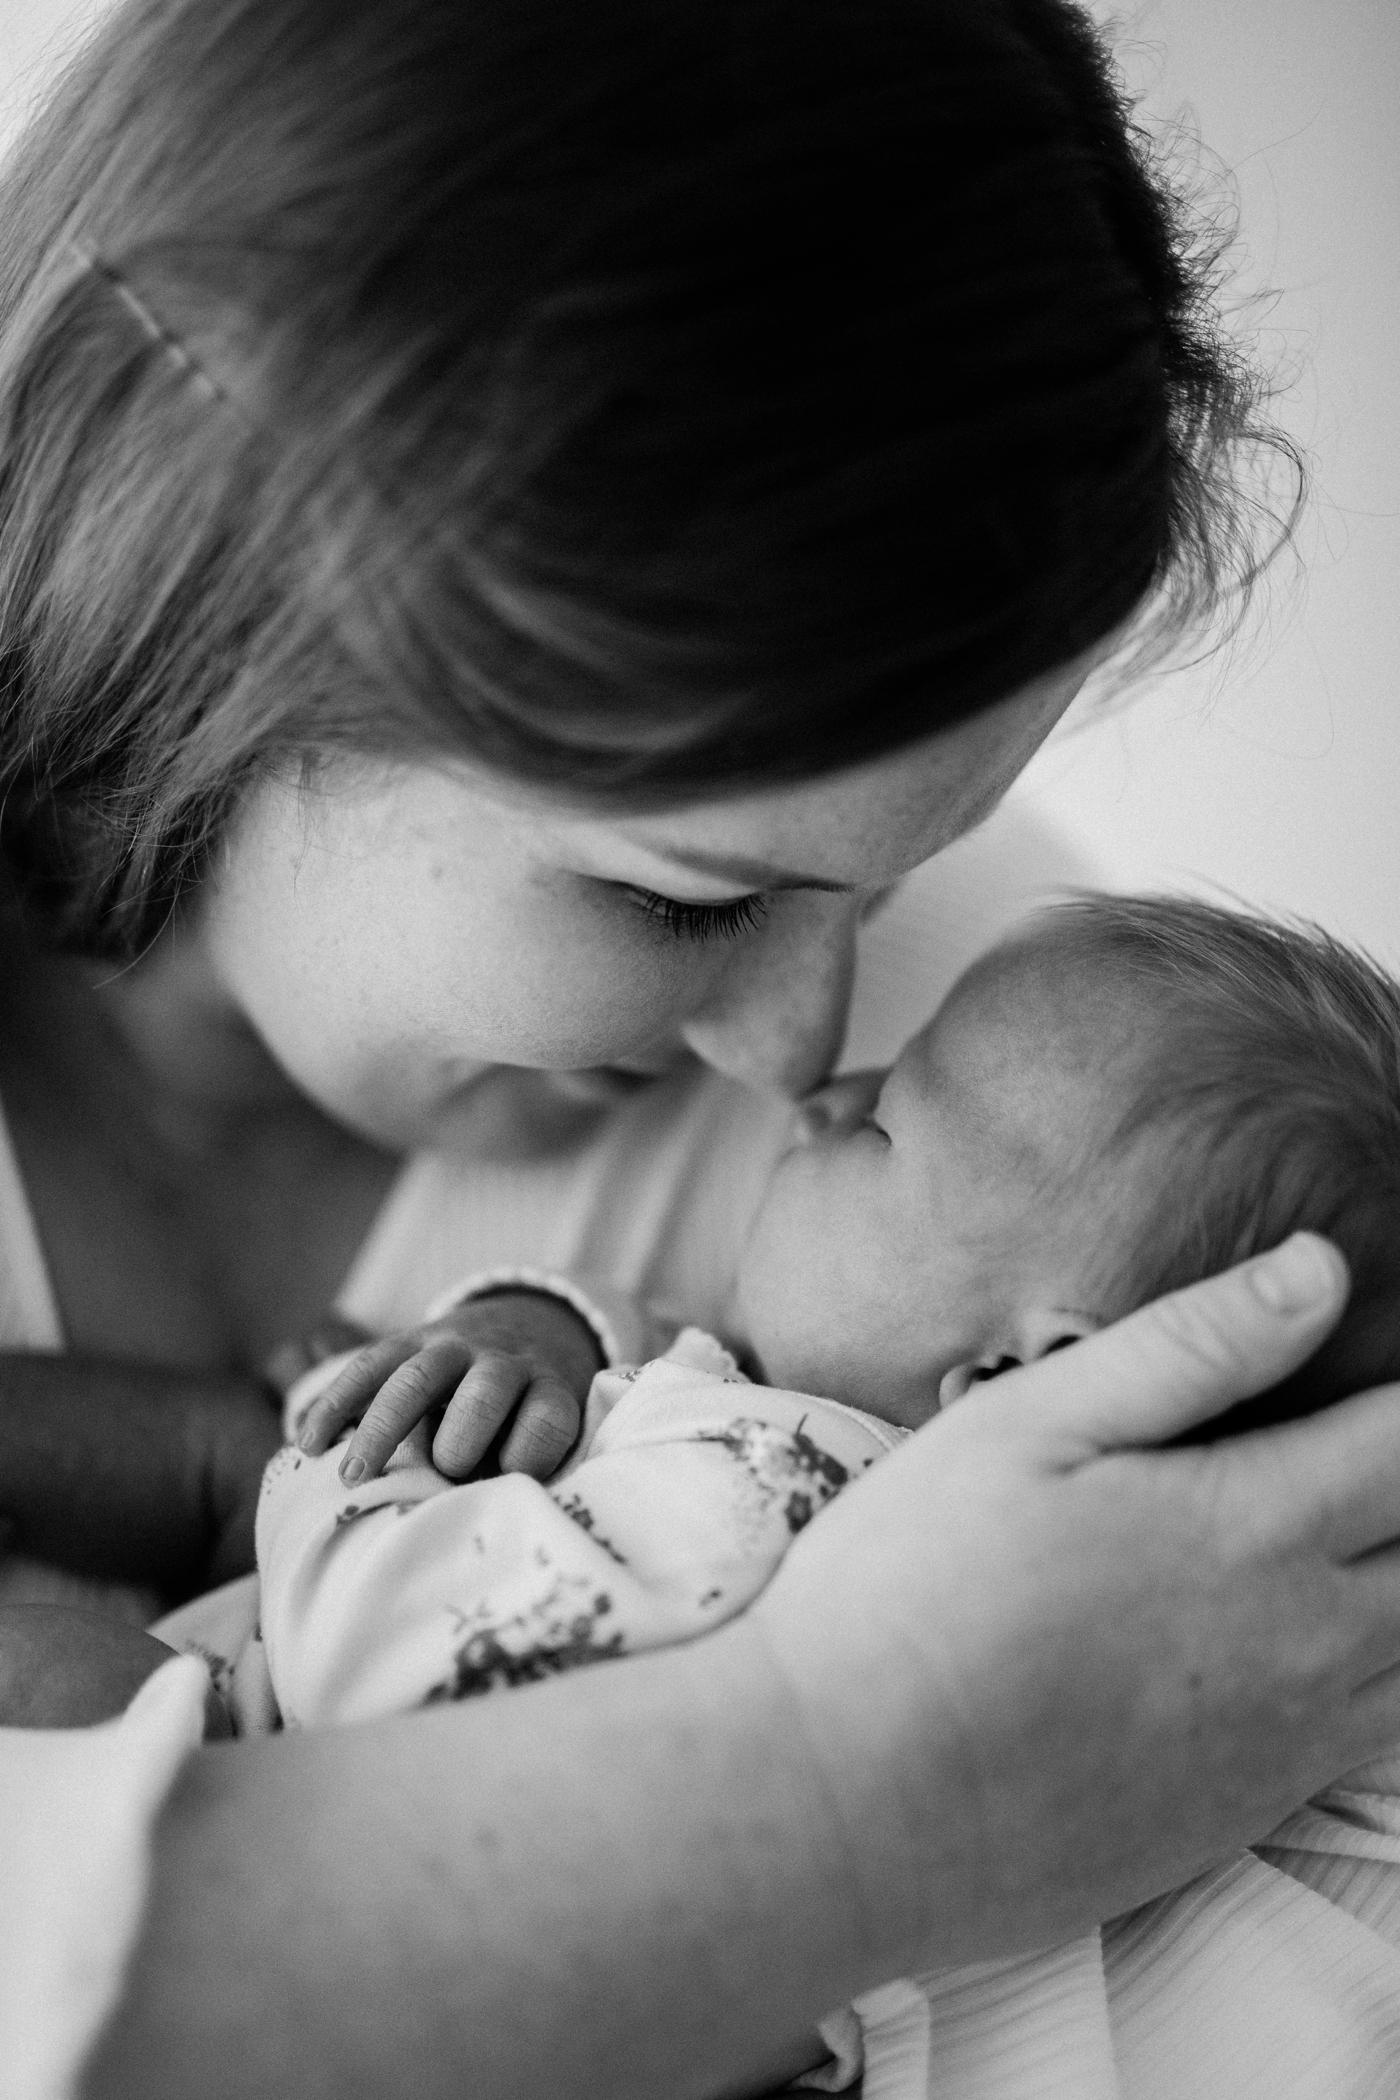 Baby Maggie - Natural Newborn Photography in Adelaide - Simple and Beautiful Newborn Photography - Katherine Schultz - Natural Light Newborn Photographer in Adelaide - www.katherineschultzphotography.com_0018.jpg